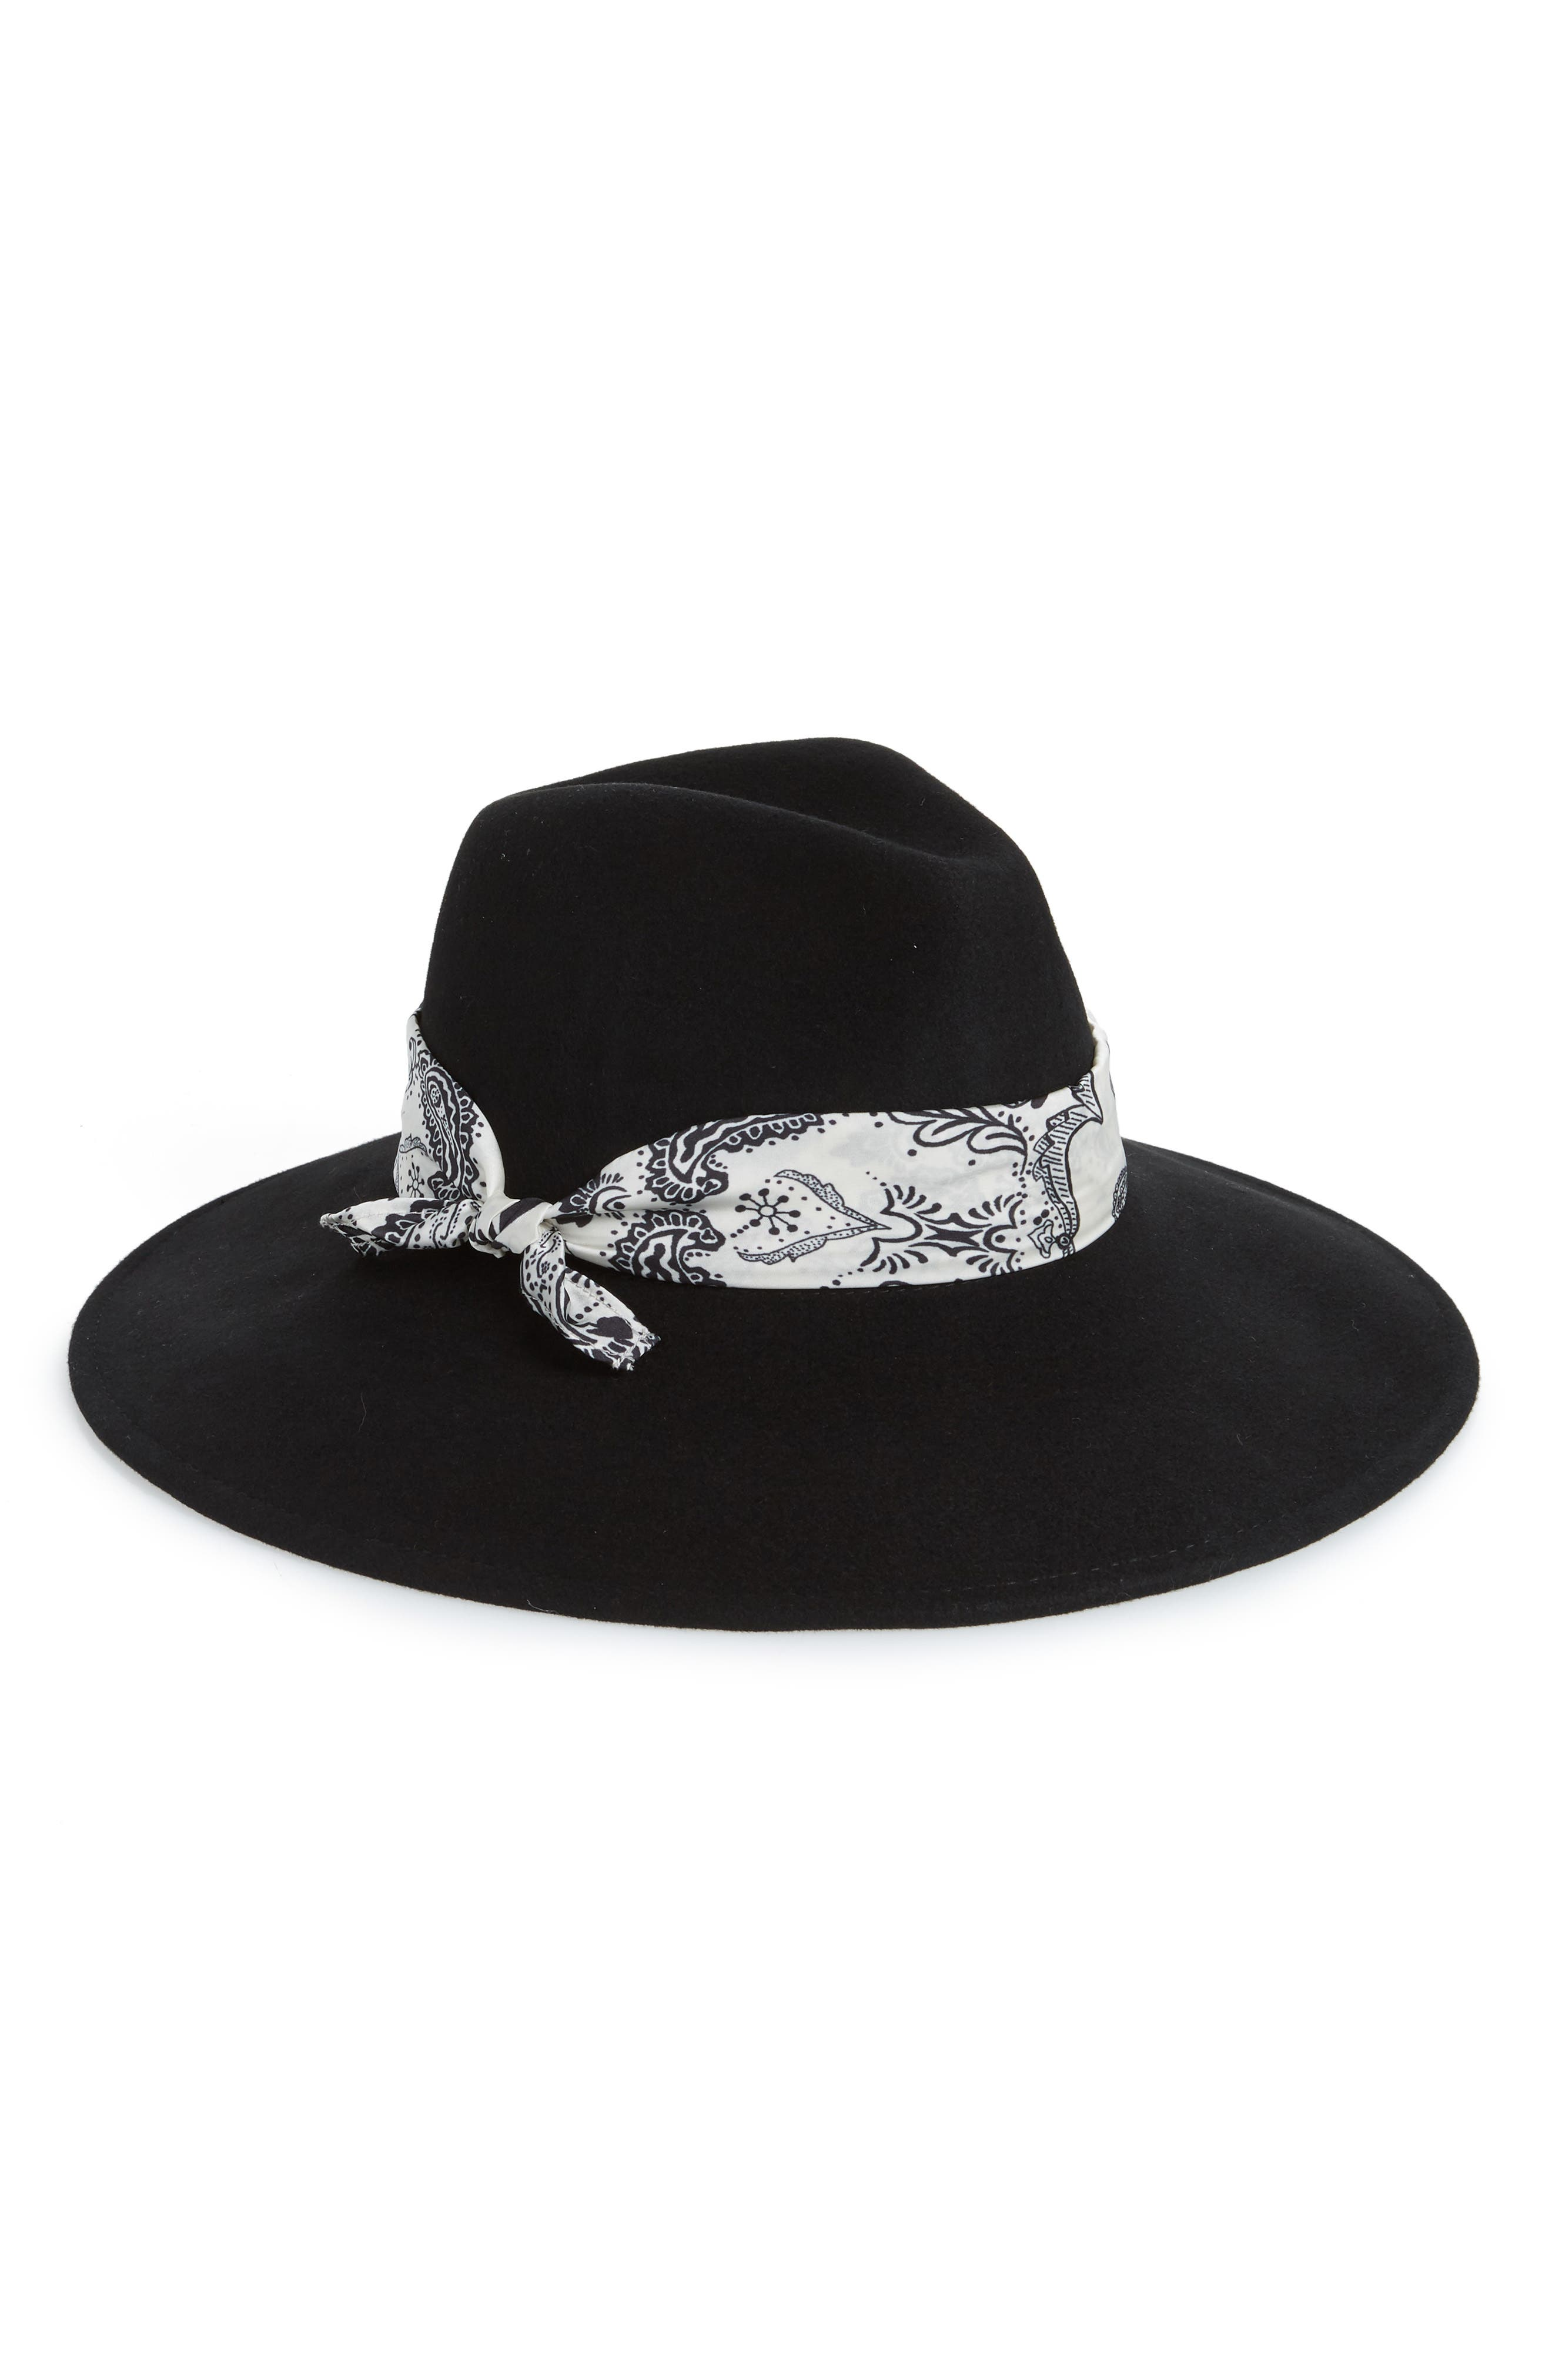 GENIE BY EUGENIA KIM Naomi Felted Wool Hat - Black